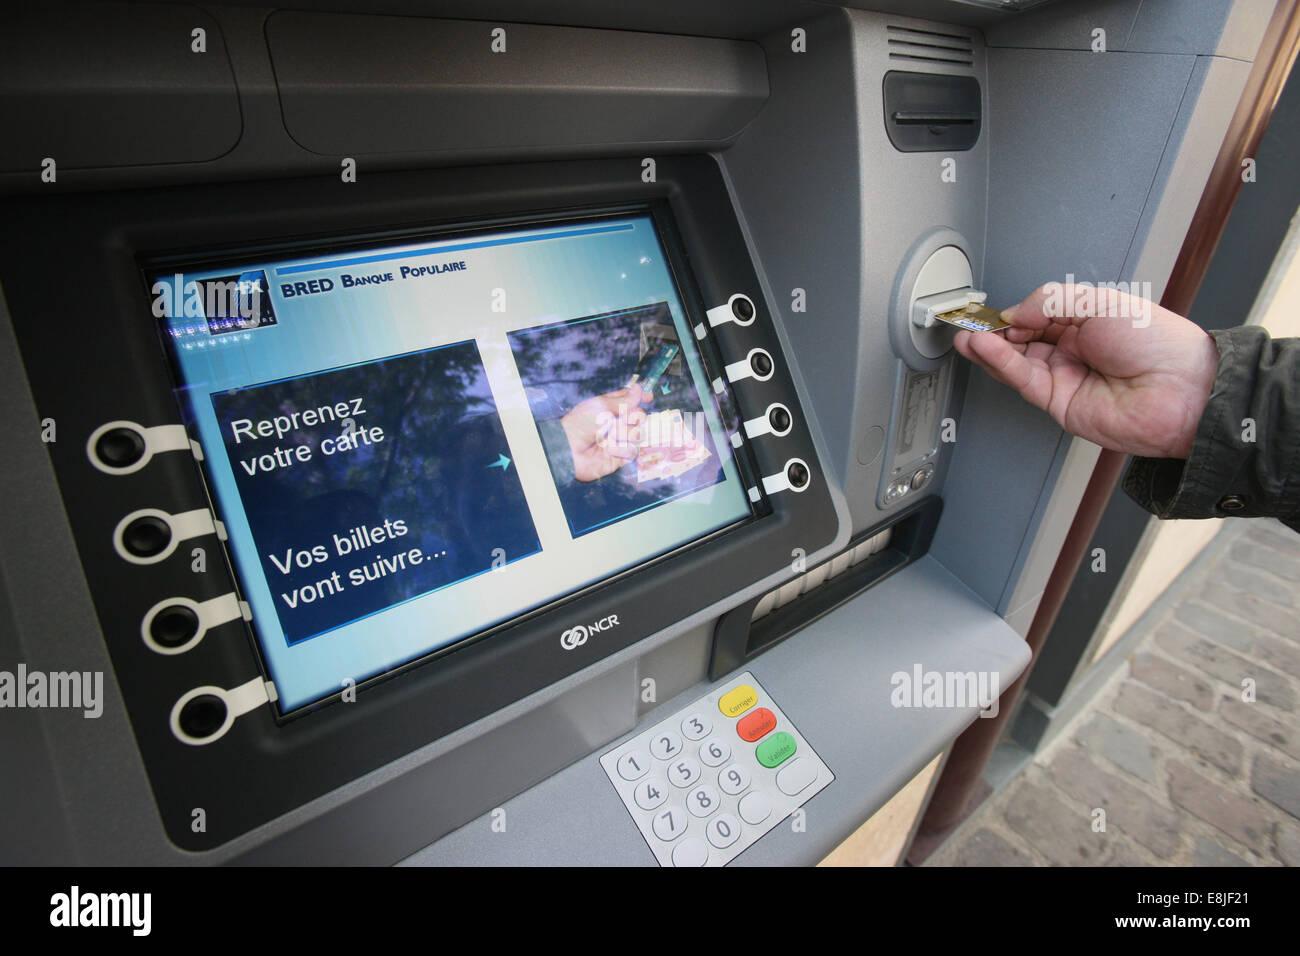 Automated Teller Machine - Stock Image